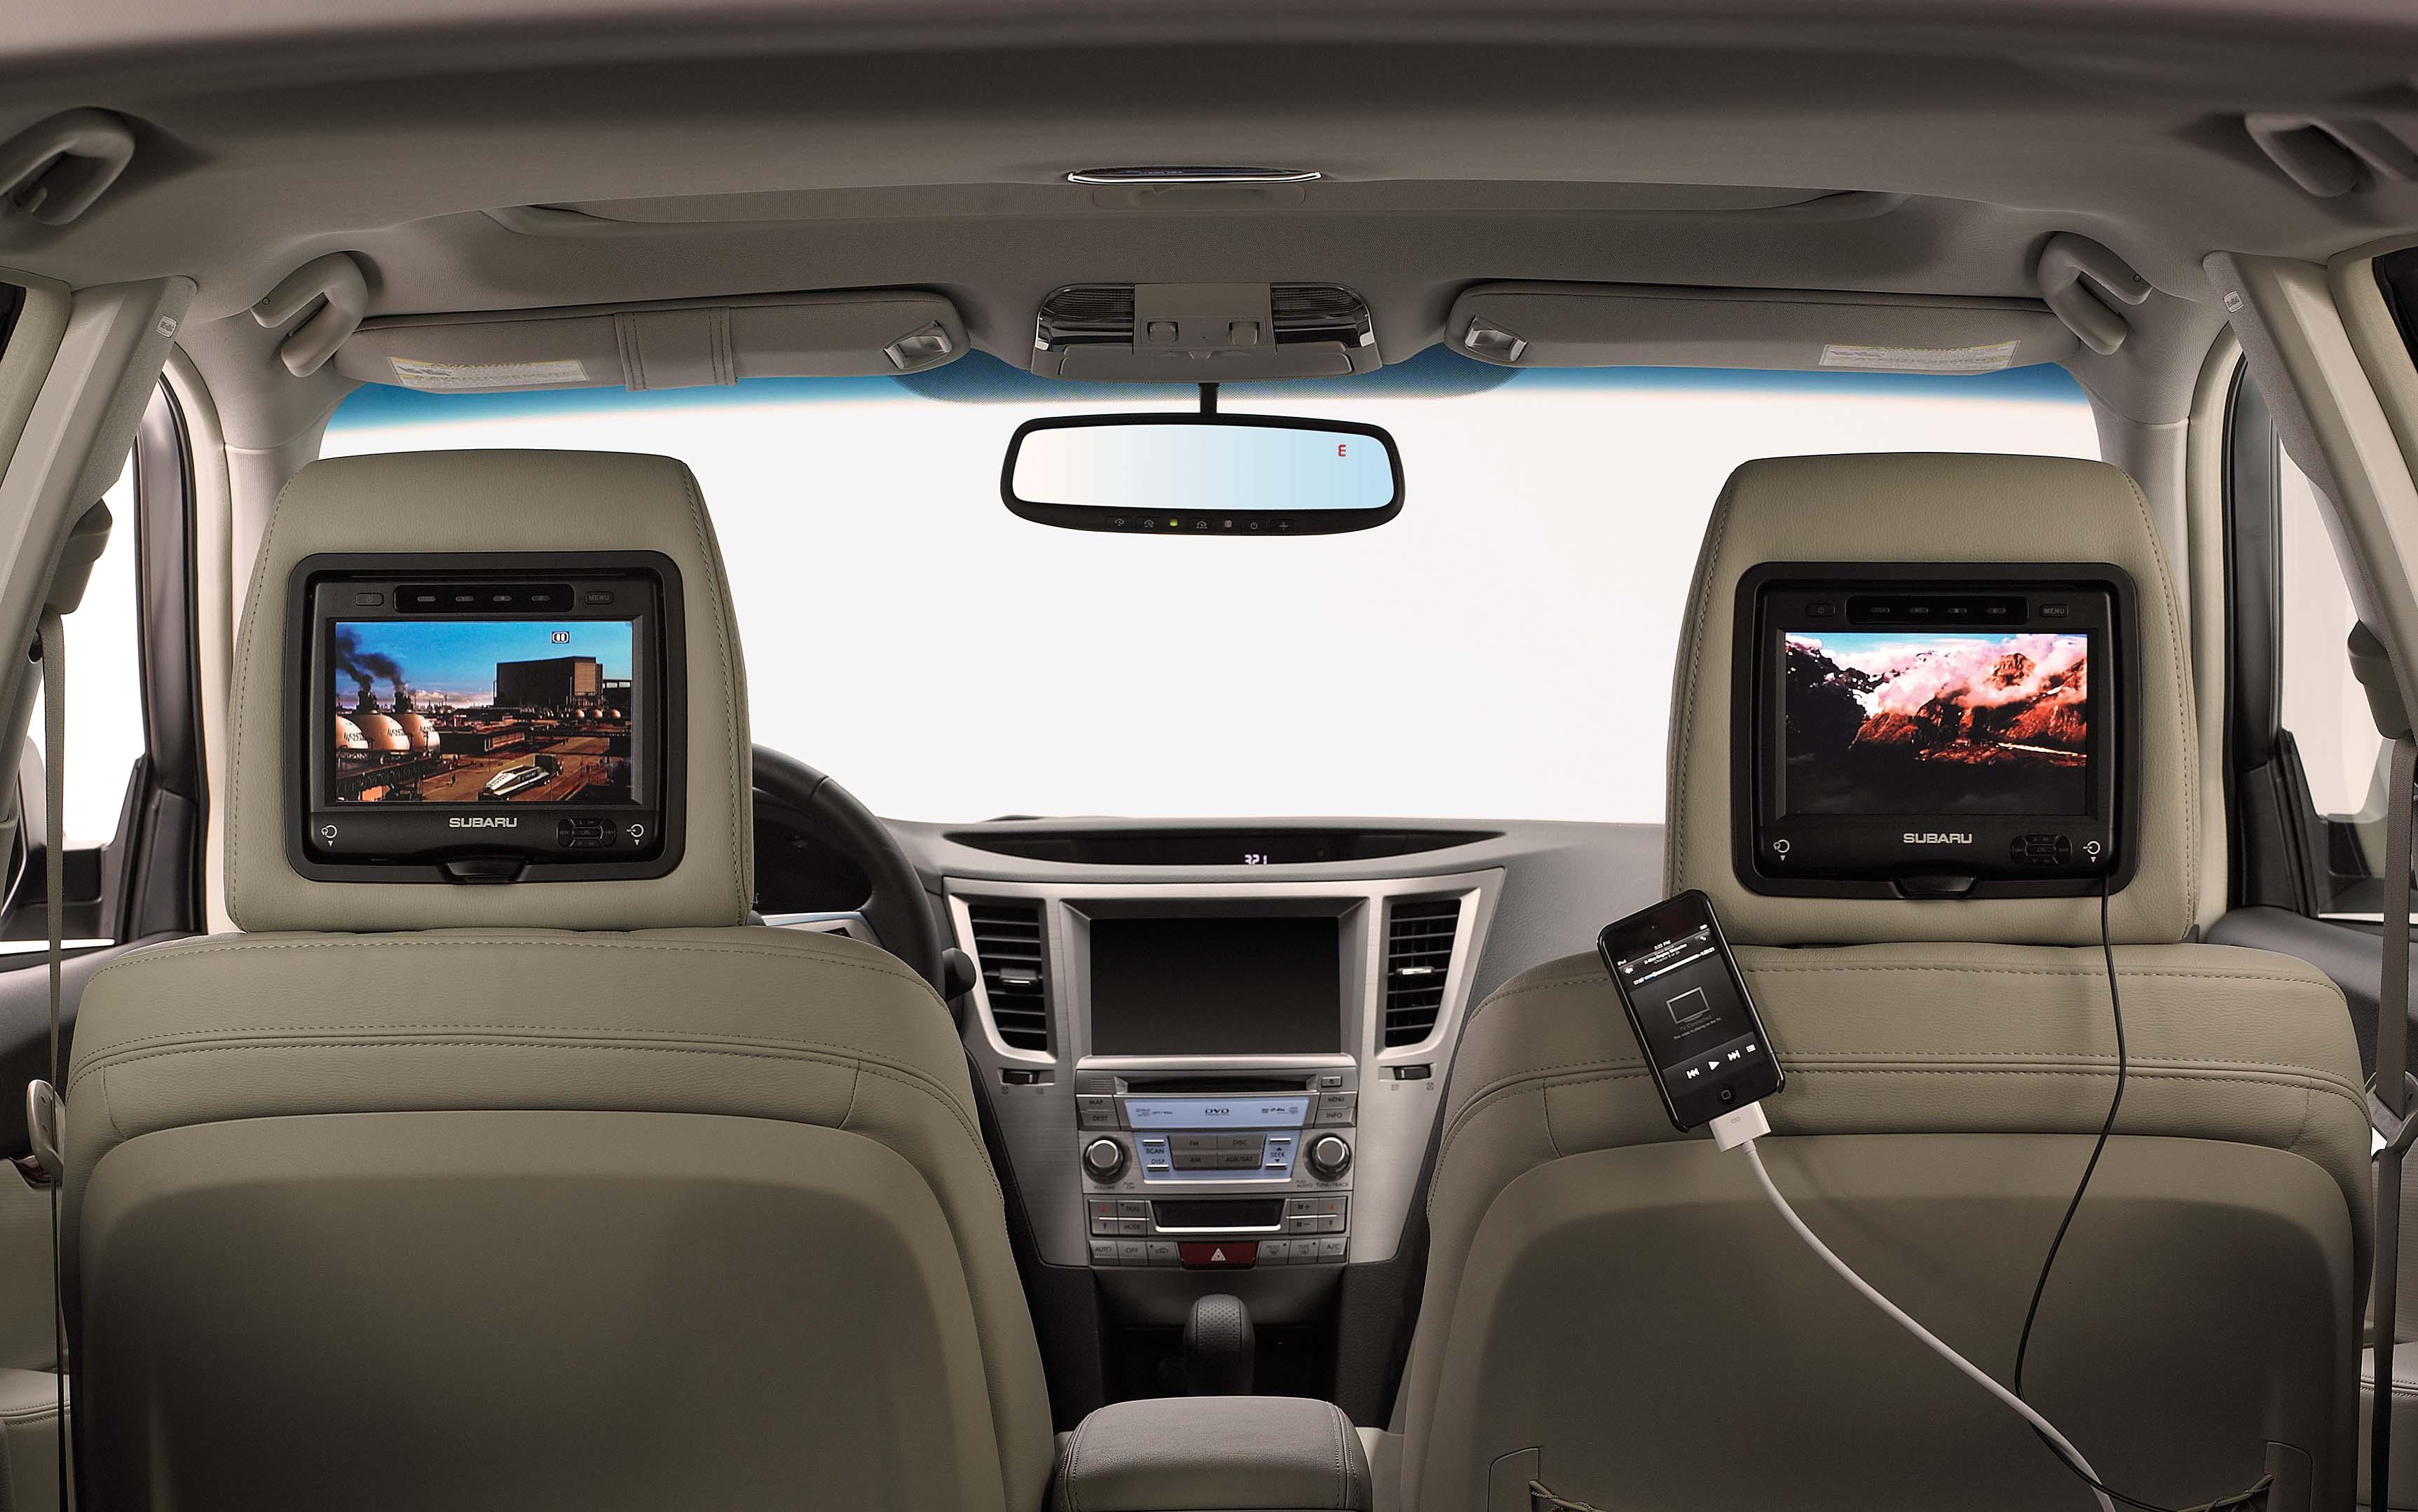 Shop Genuine 2014 Subaru Outback Accessories Subaru Of